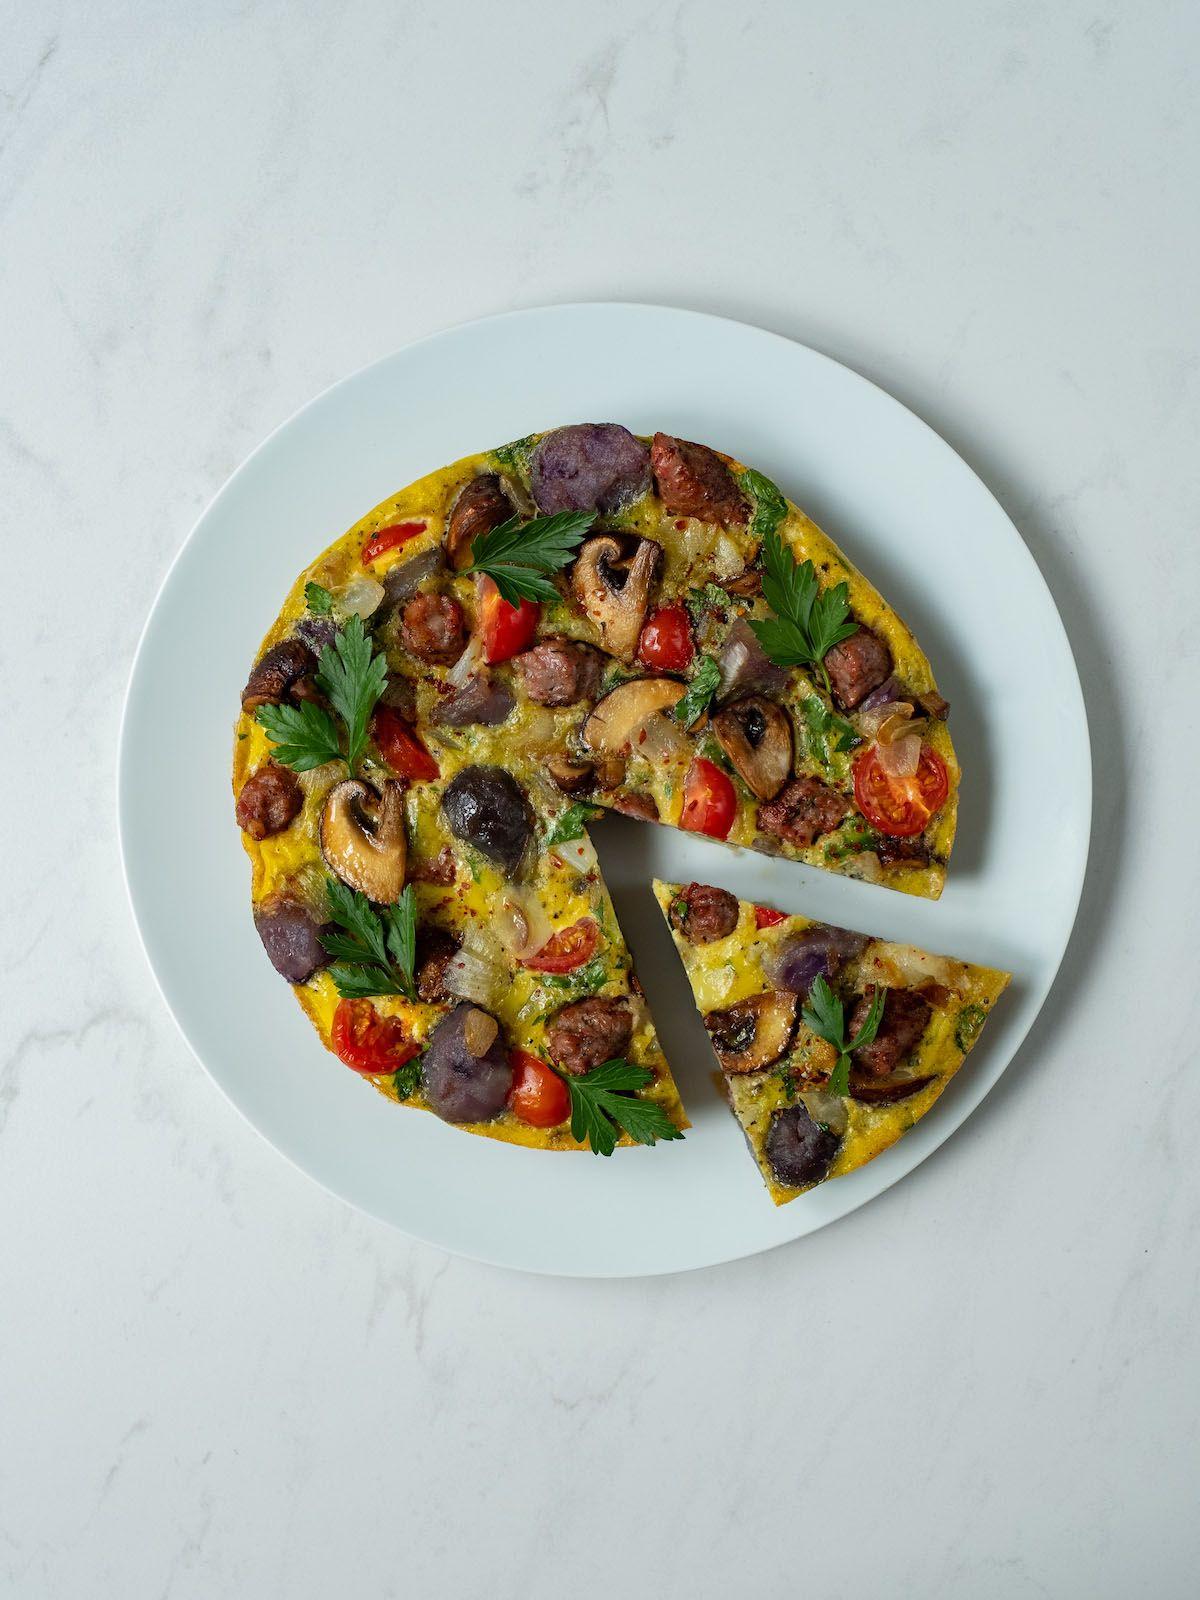 About Fuel, Foodblog, Rezept, Tortilla, Tomaten, Ei, Petersilie, Champignons